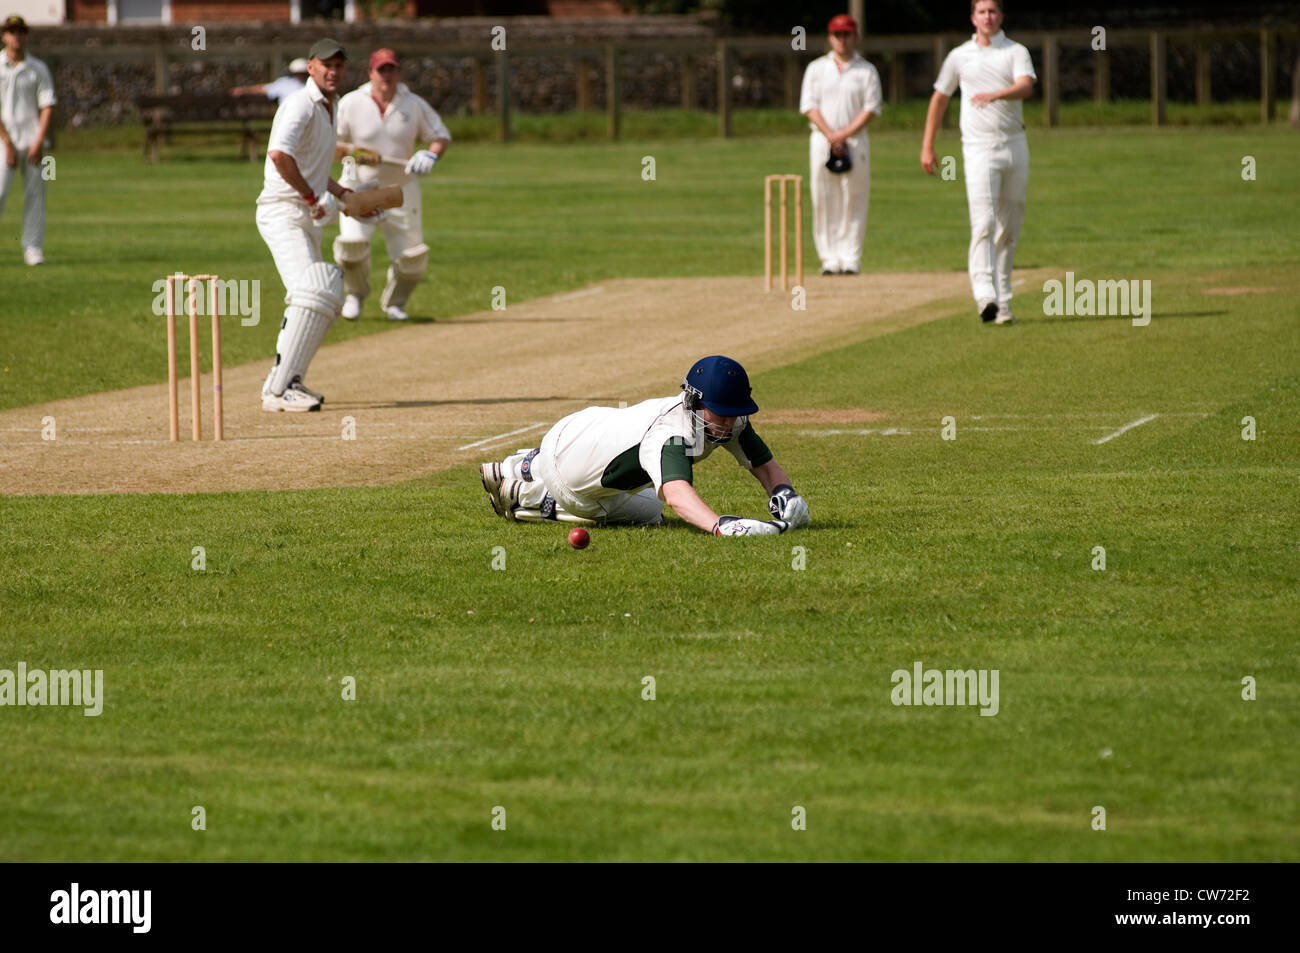 cricket match village green play playing players bat batsman bowler wicketkeeper wicket wickets grass green uk english - Stock Image